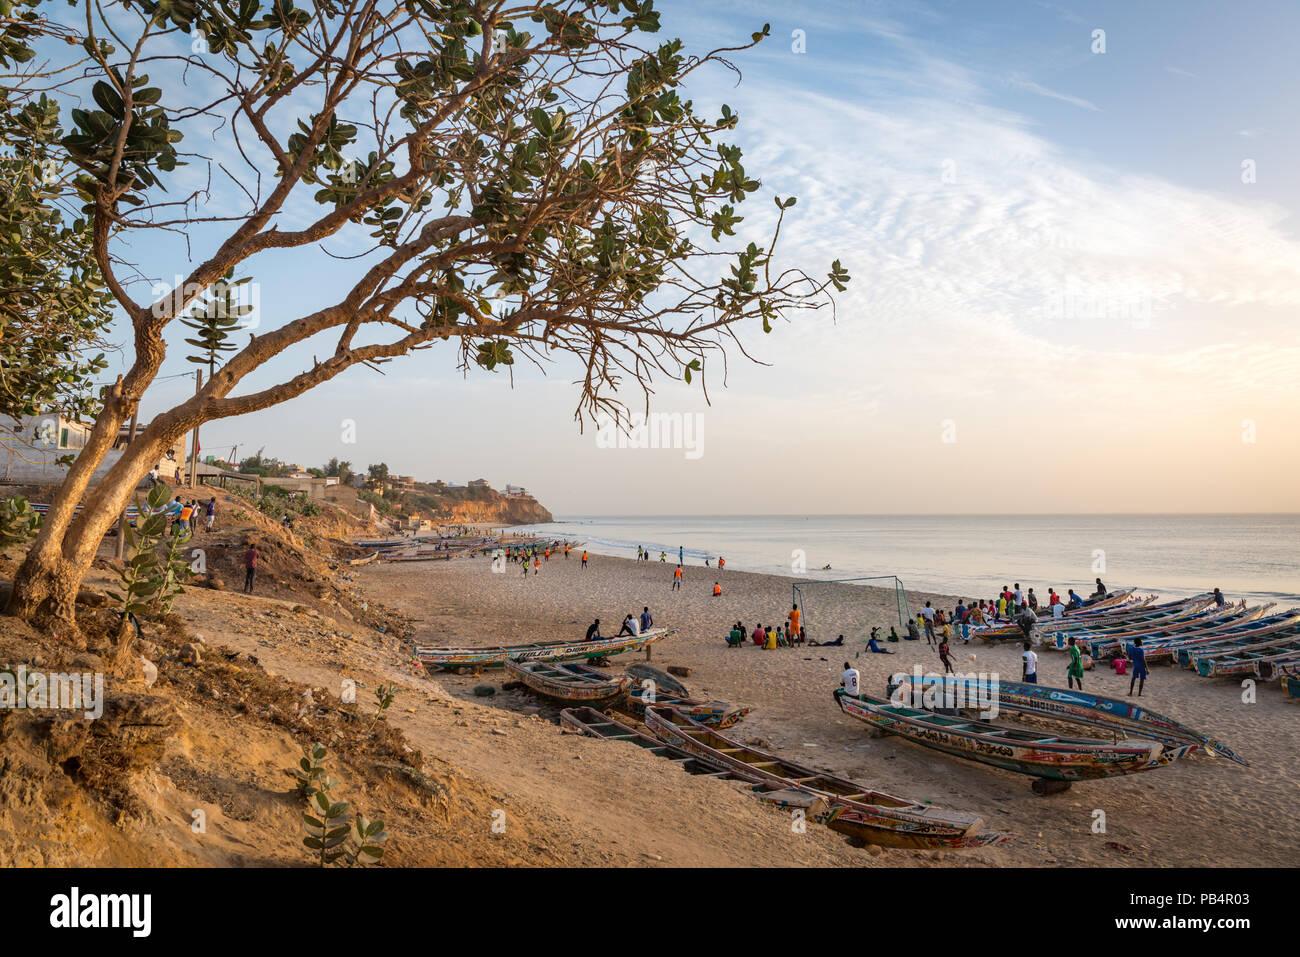 La plage de Toubab Dialao, Sénégal Photo Stock